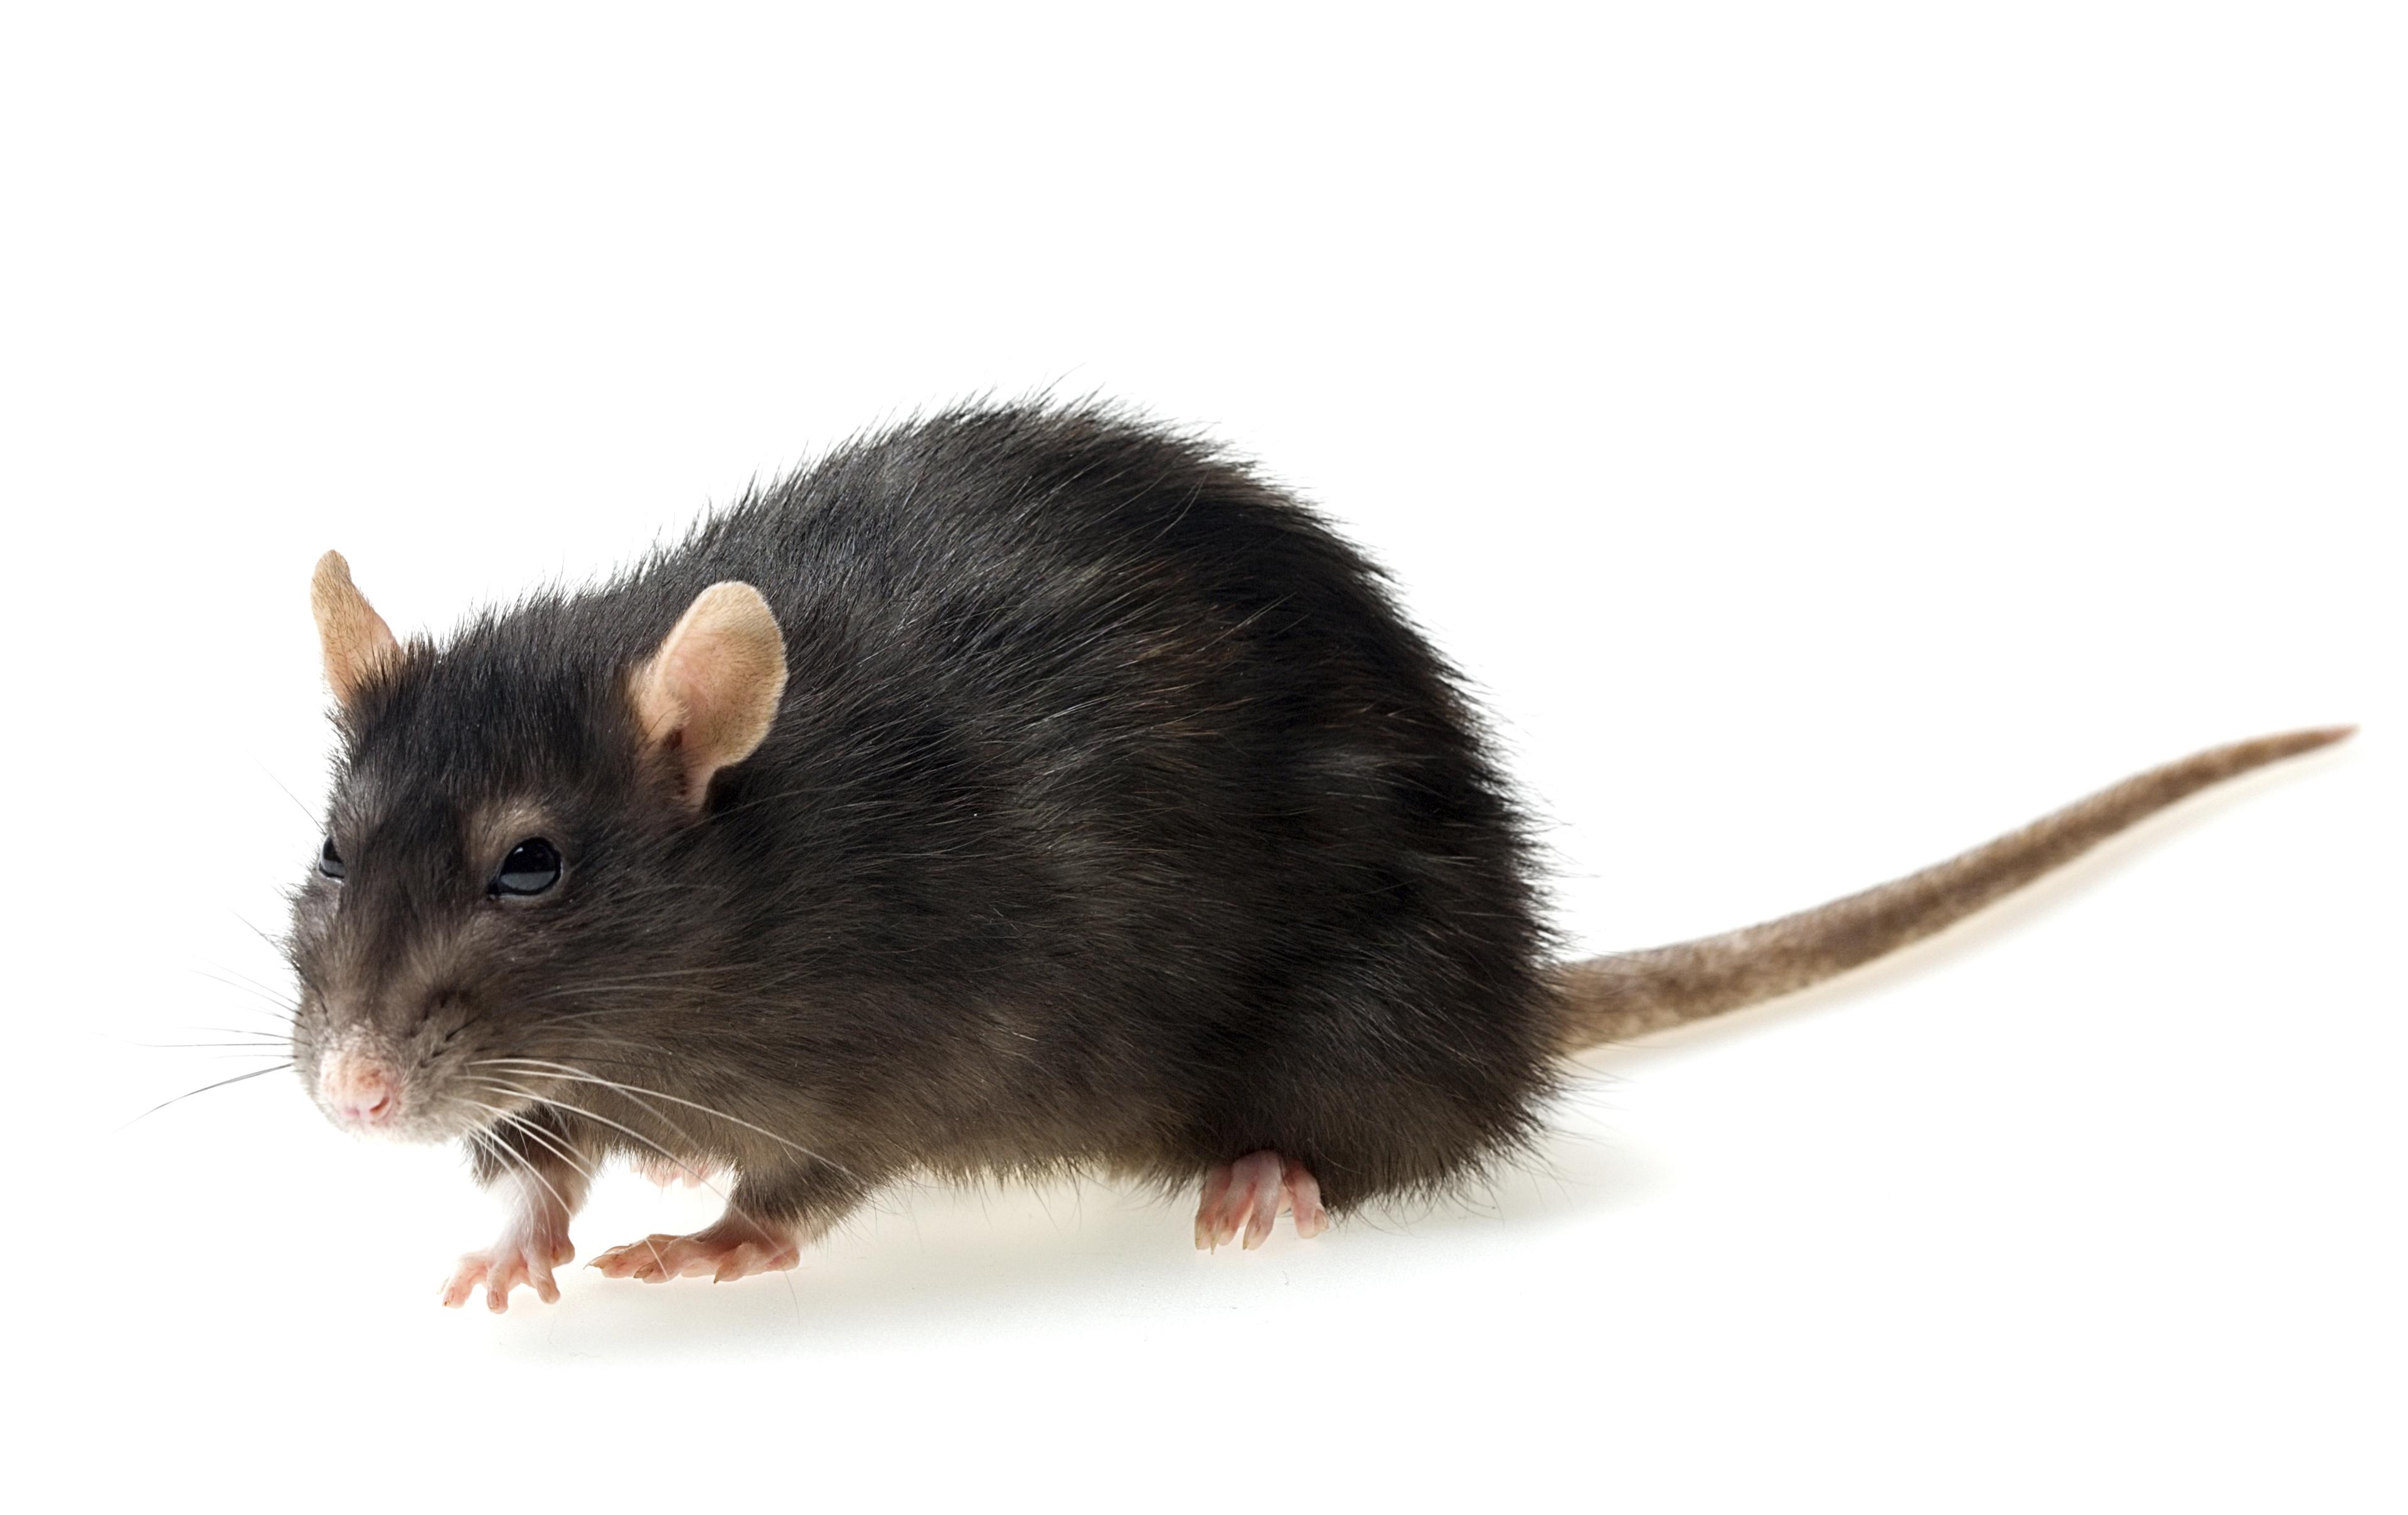 Rat Hd Background